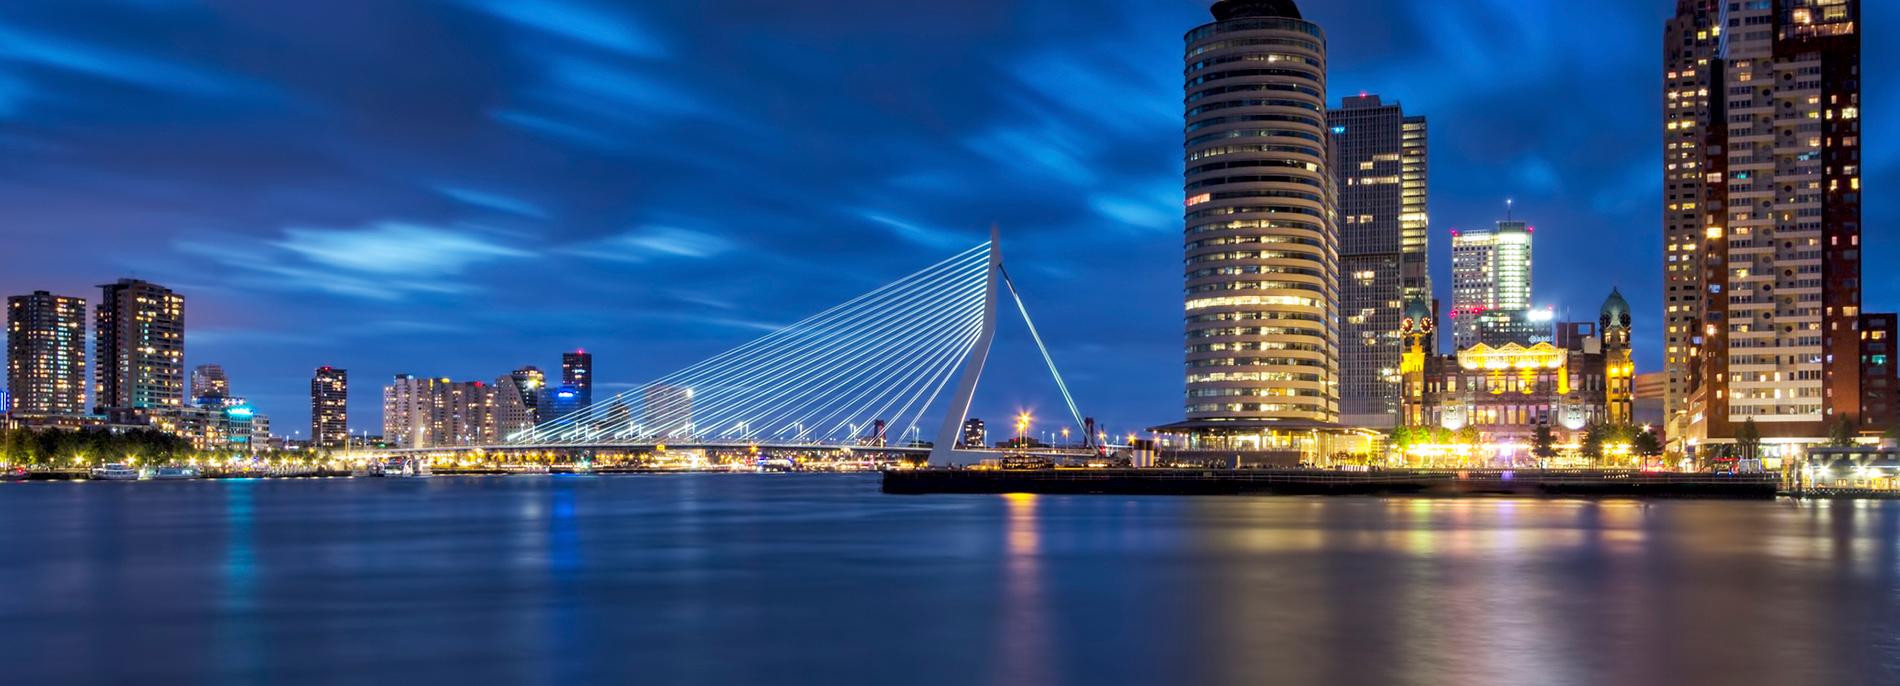 Spice brokers Europe Rotterdam